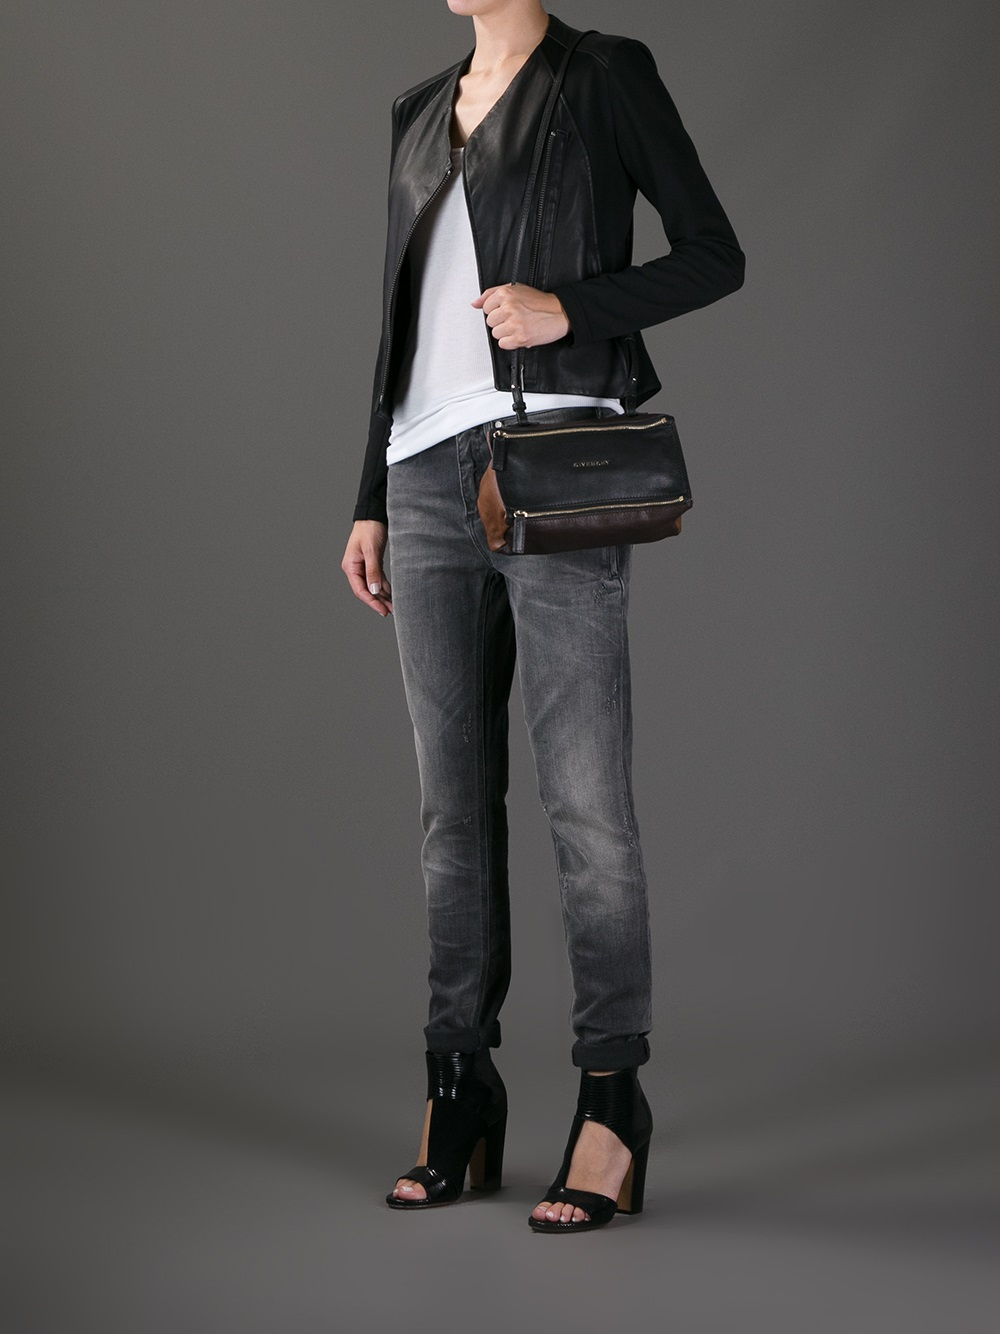 749df7e5ff Lyst - Givenchy Pandora Mini Bicolour Bag in Black